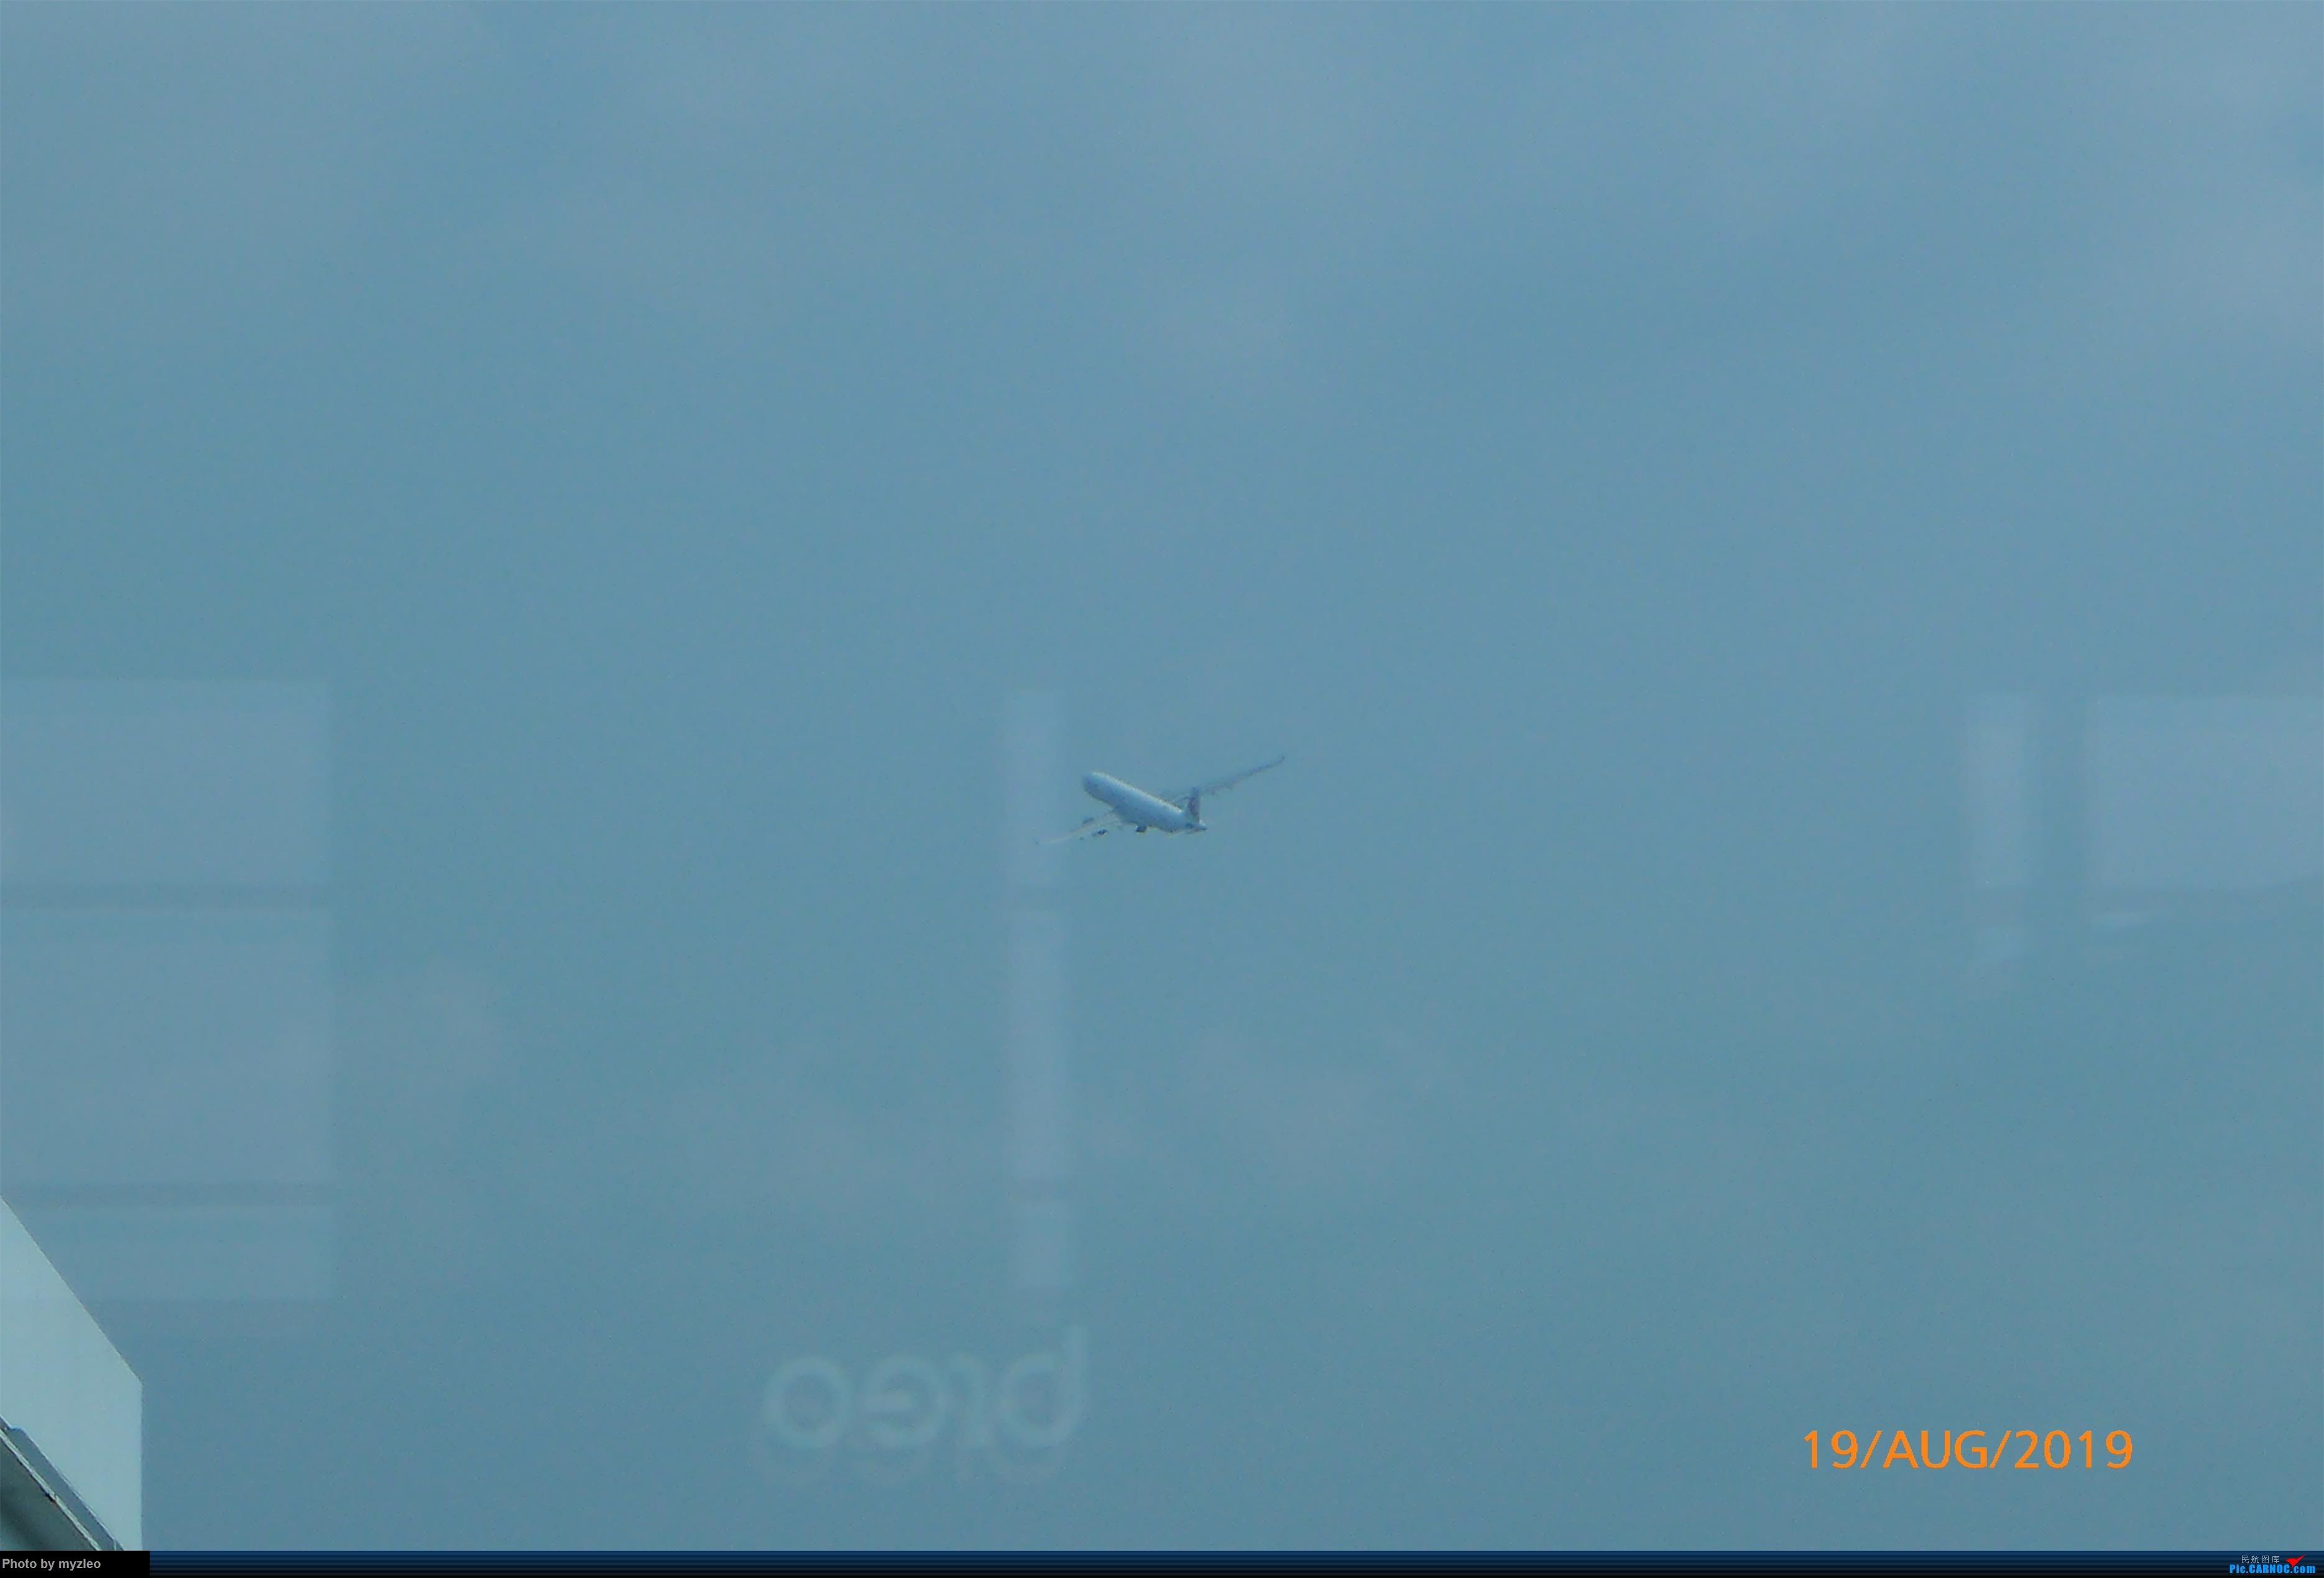 Re:[原创]【myzleo的游记5.1】梦圆一九(1)首搭国航359,北京城里到处走 AIRBUS A330-300 B-6506 中国上海虹桥国际机场